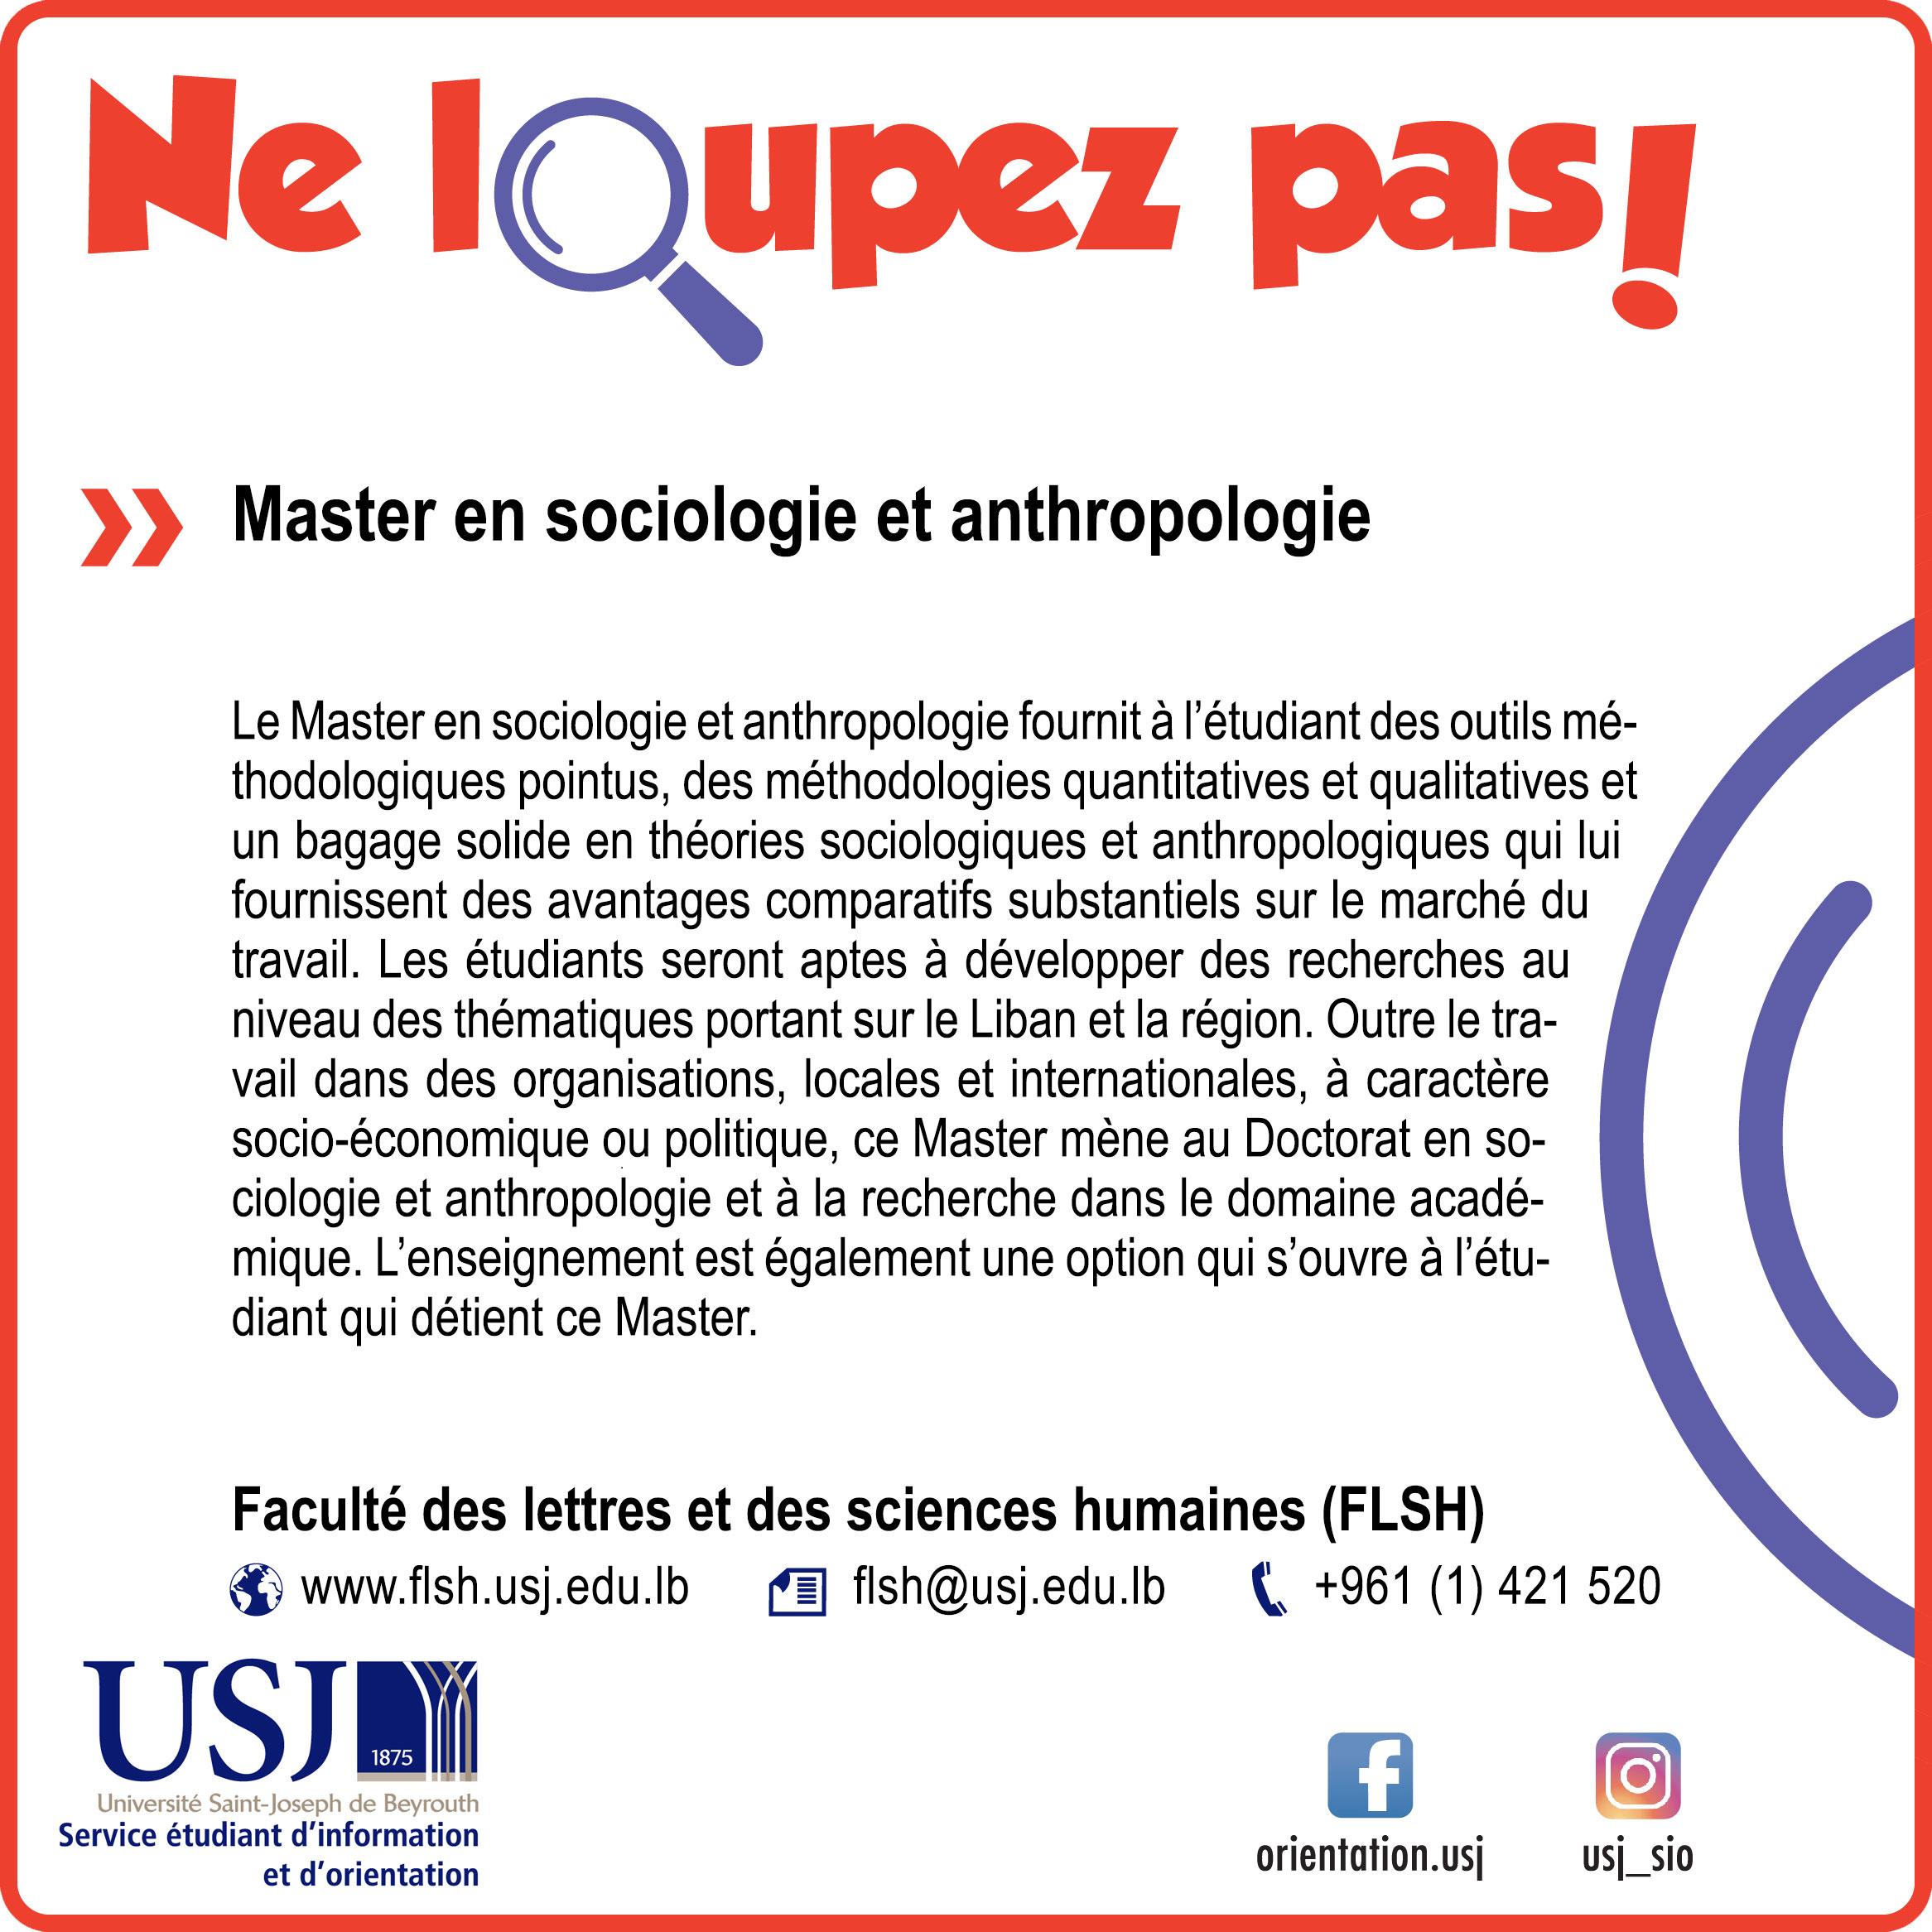 Master en sociologie et anthropologie